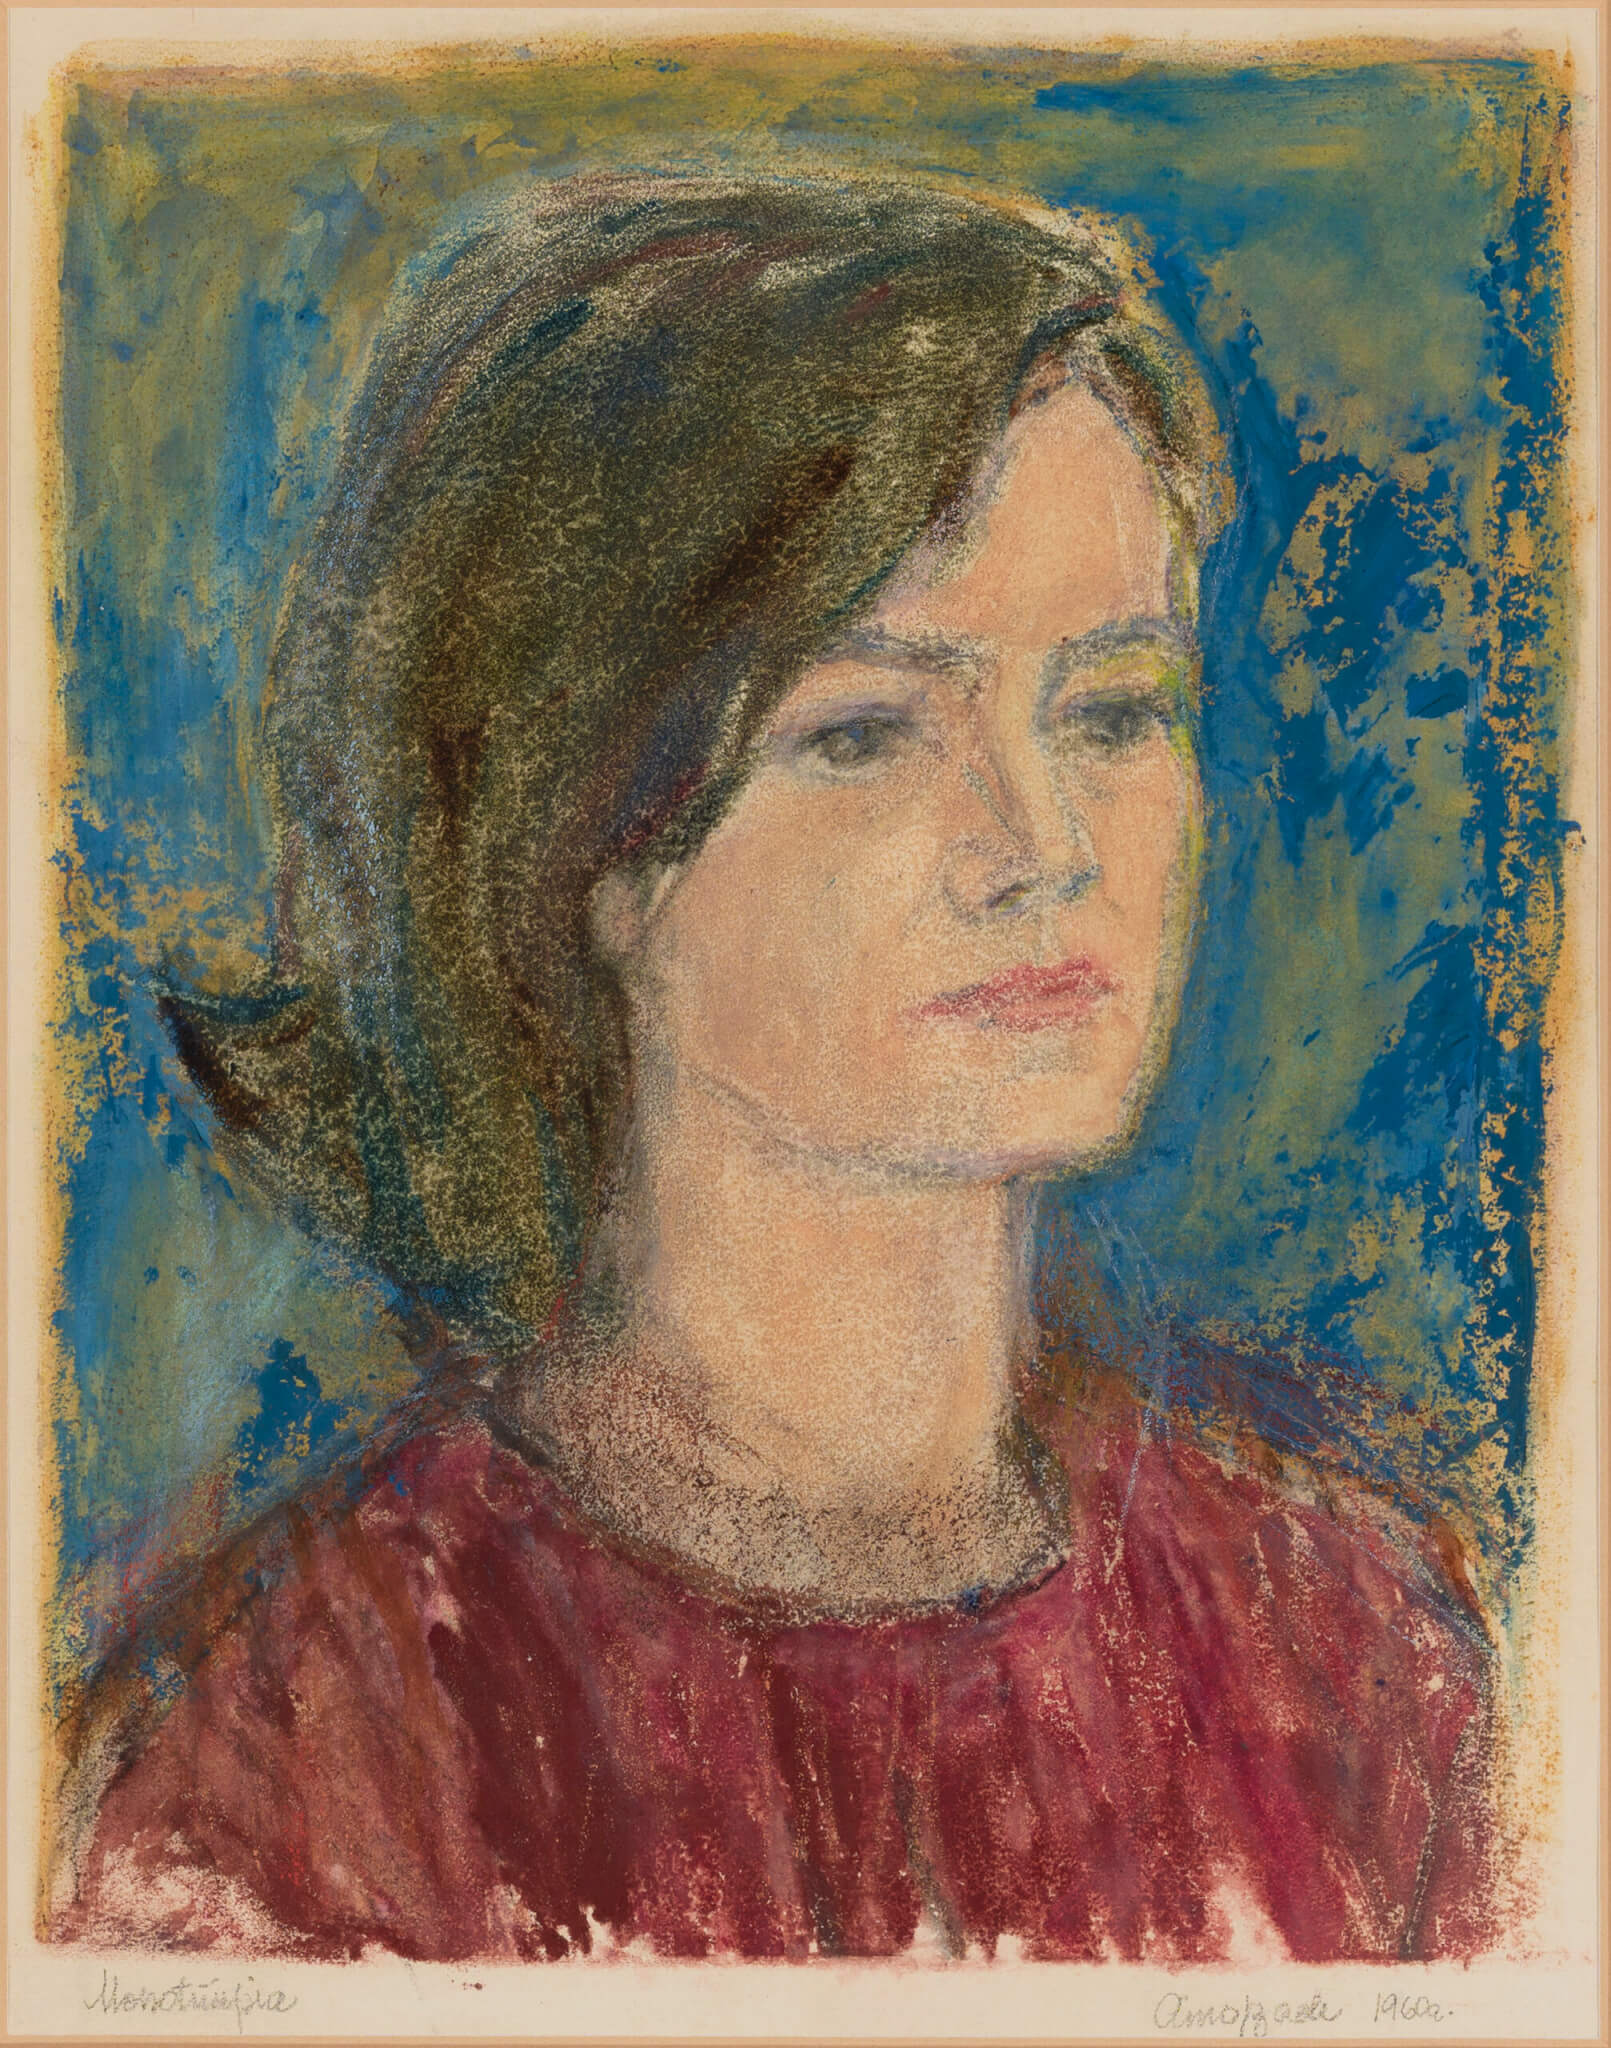 Aino-Bach-Neiu-portree-Allee-galerii-kunstiklassika-oksjon